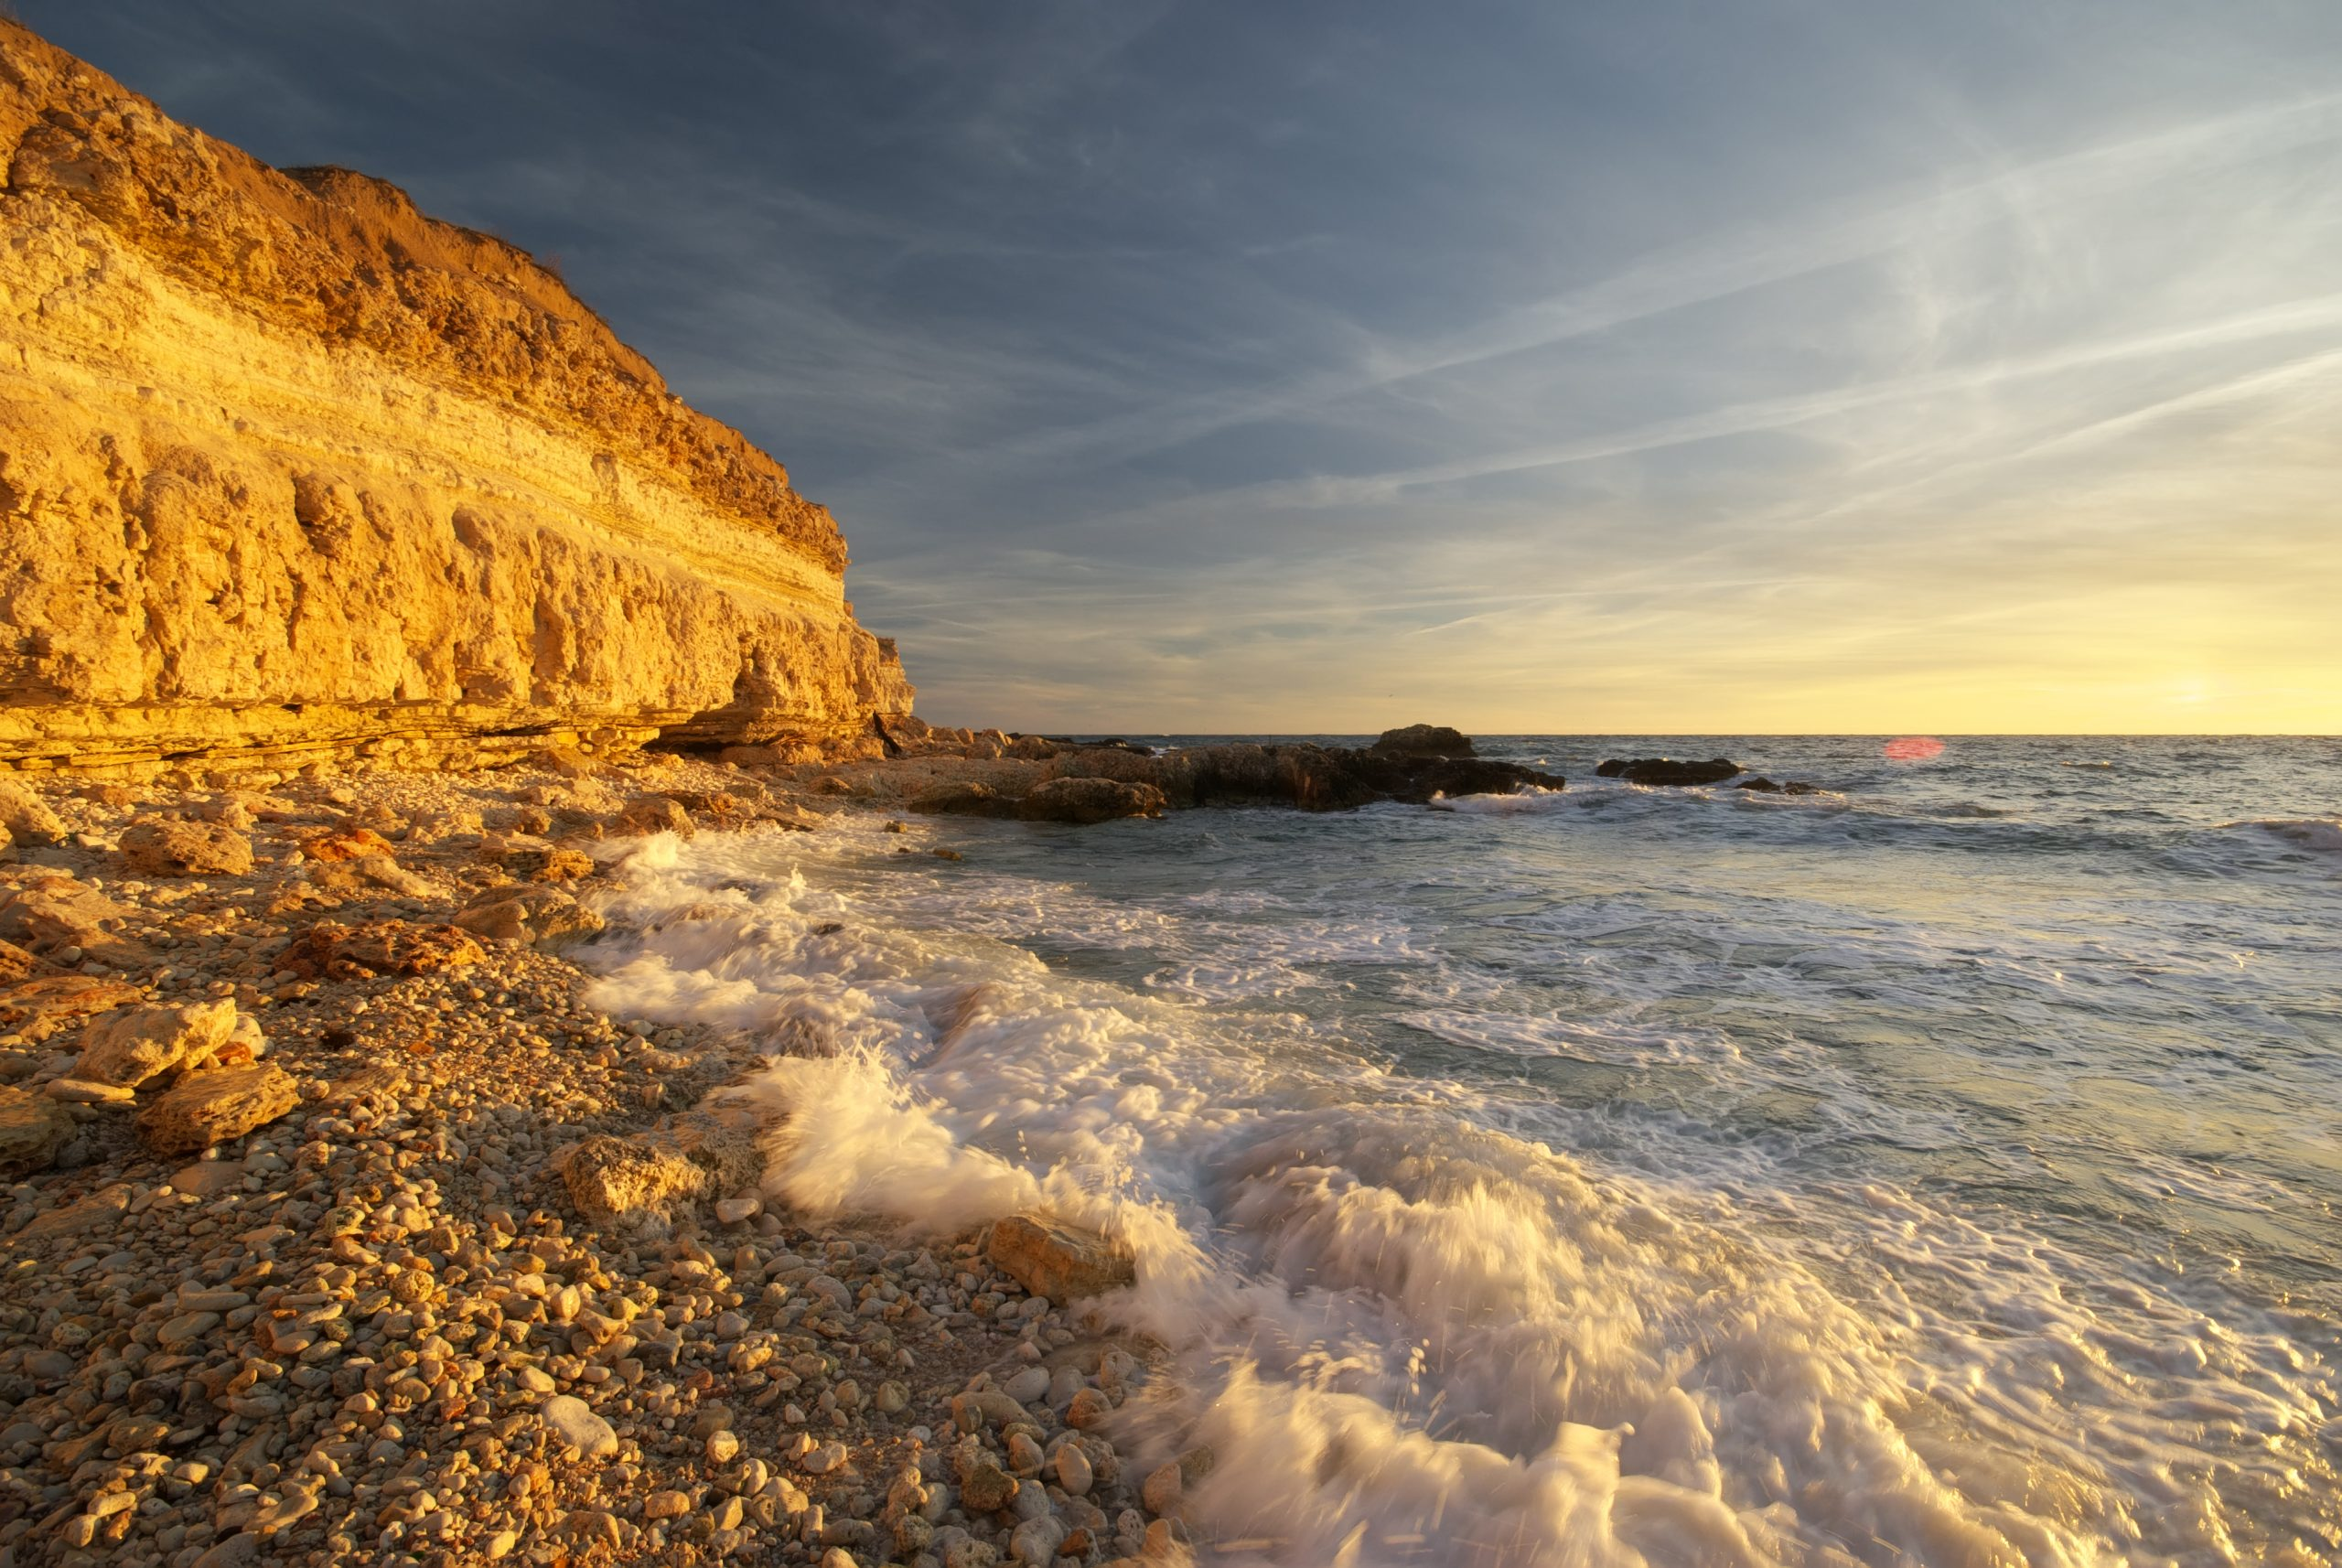 beautiful-seascape-nature-WGL5QTF-scaled.jpg